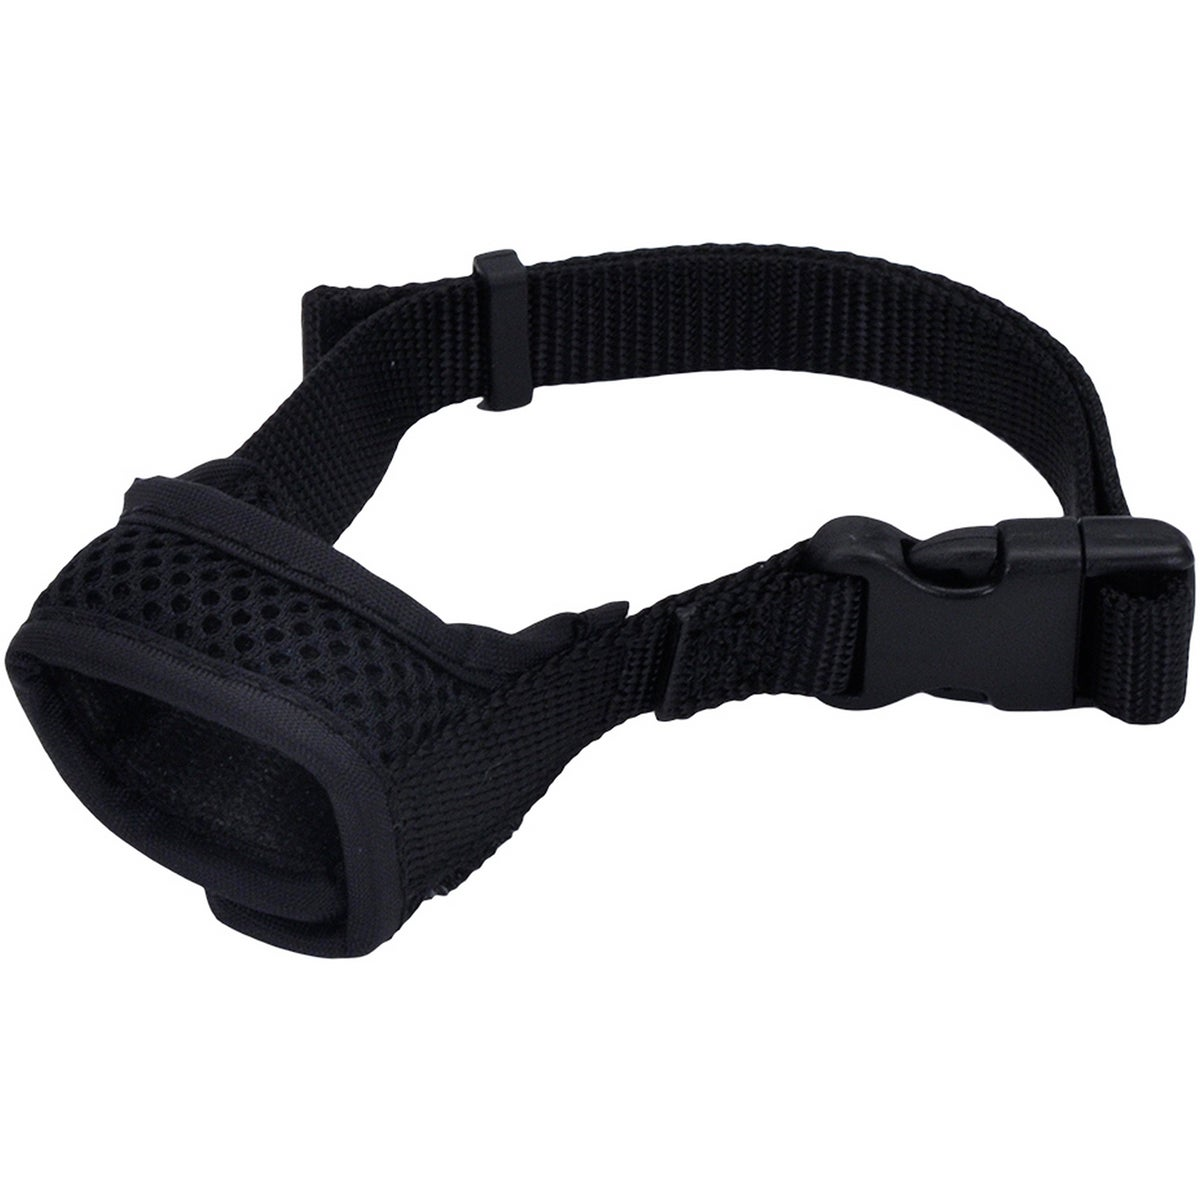 Coastal Pet Best Fit Adjustable Comfort Dog Muzzle - Blac...